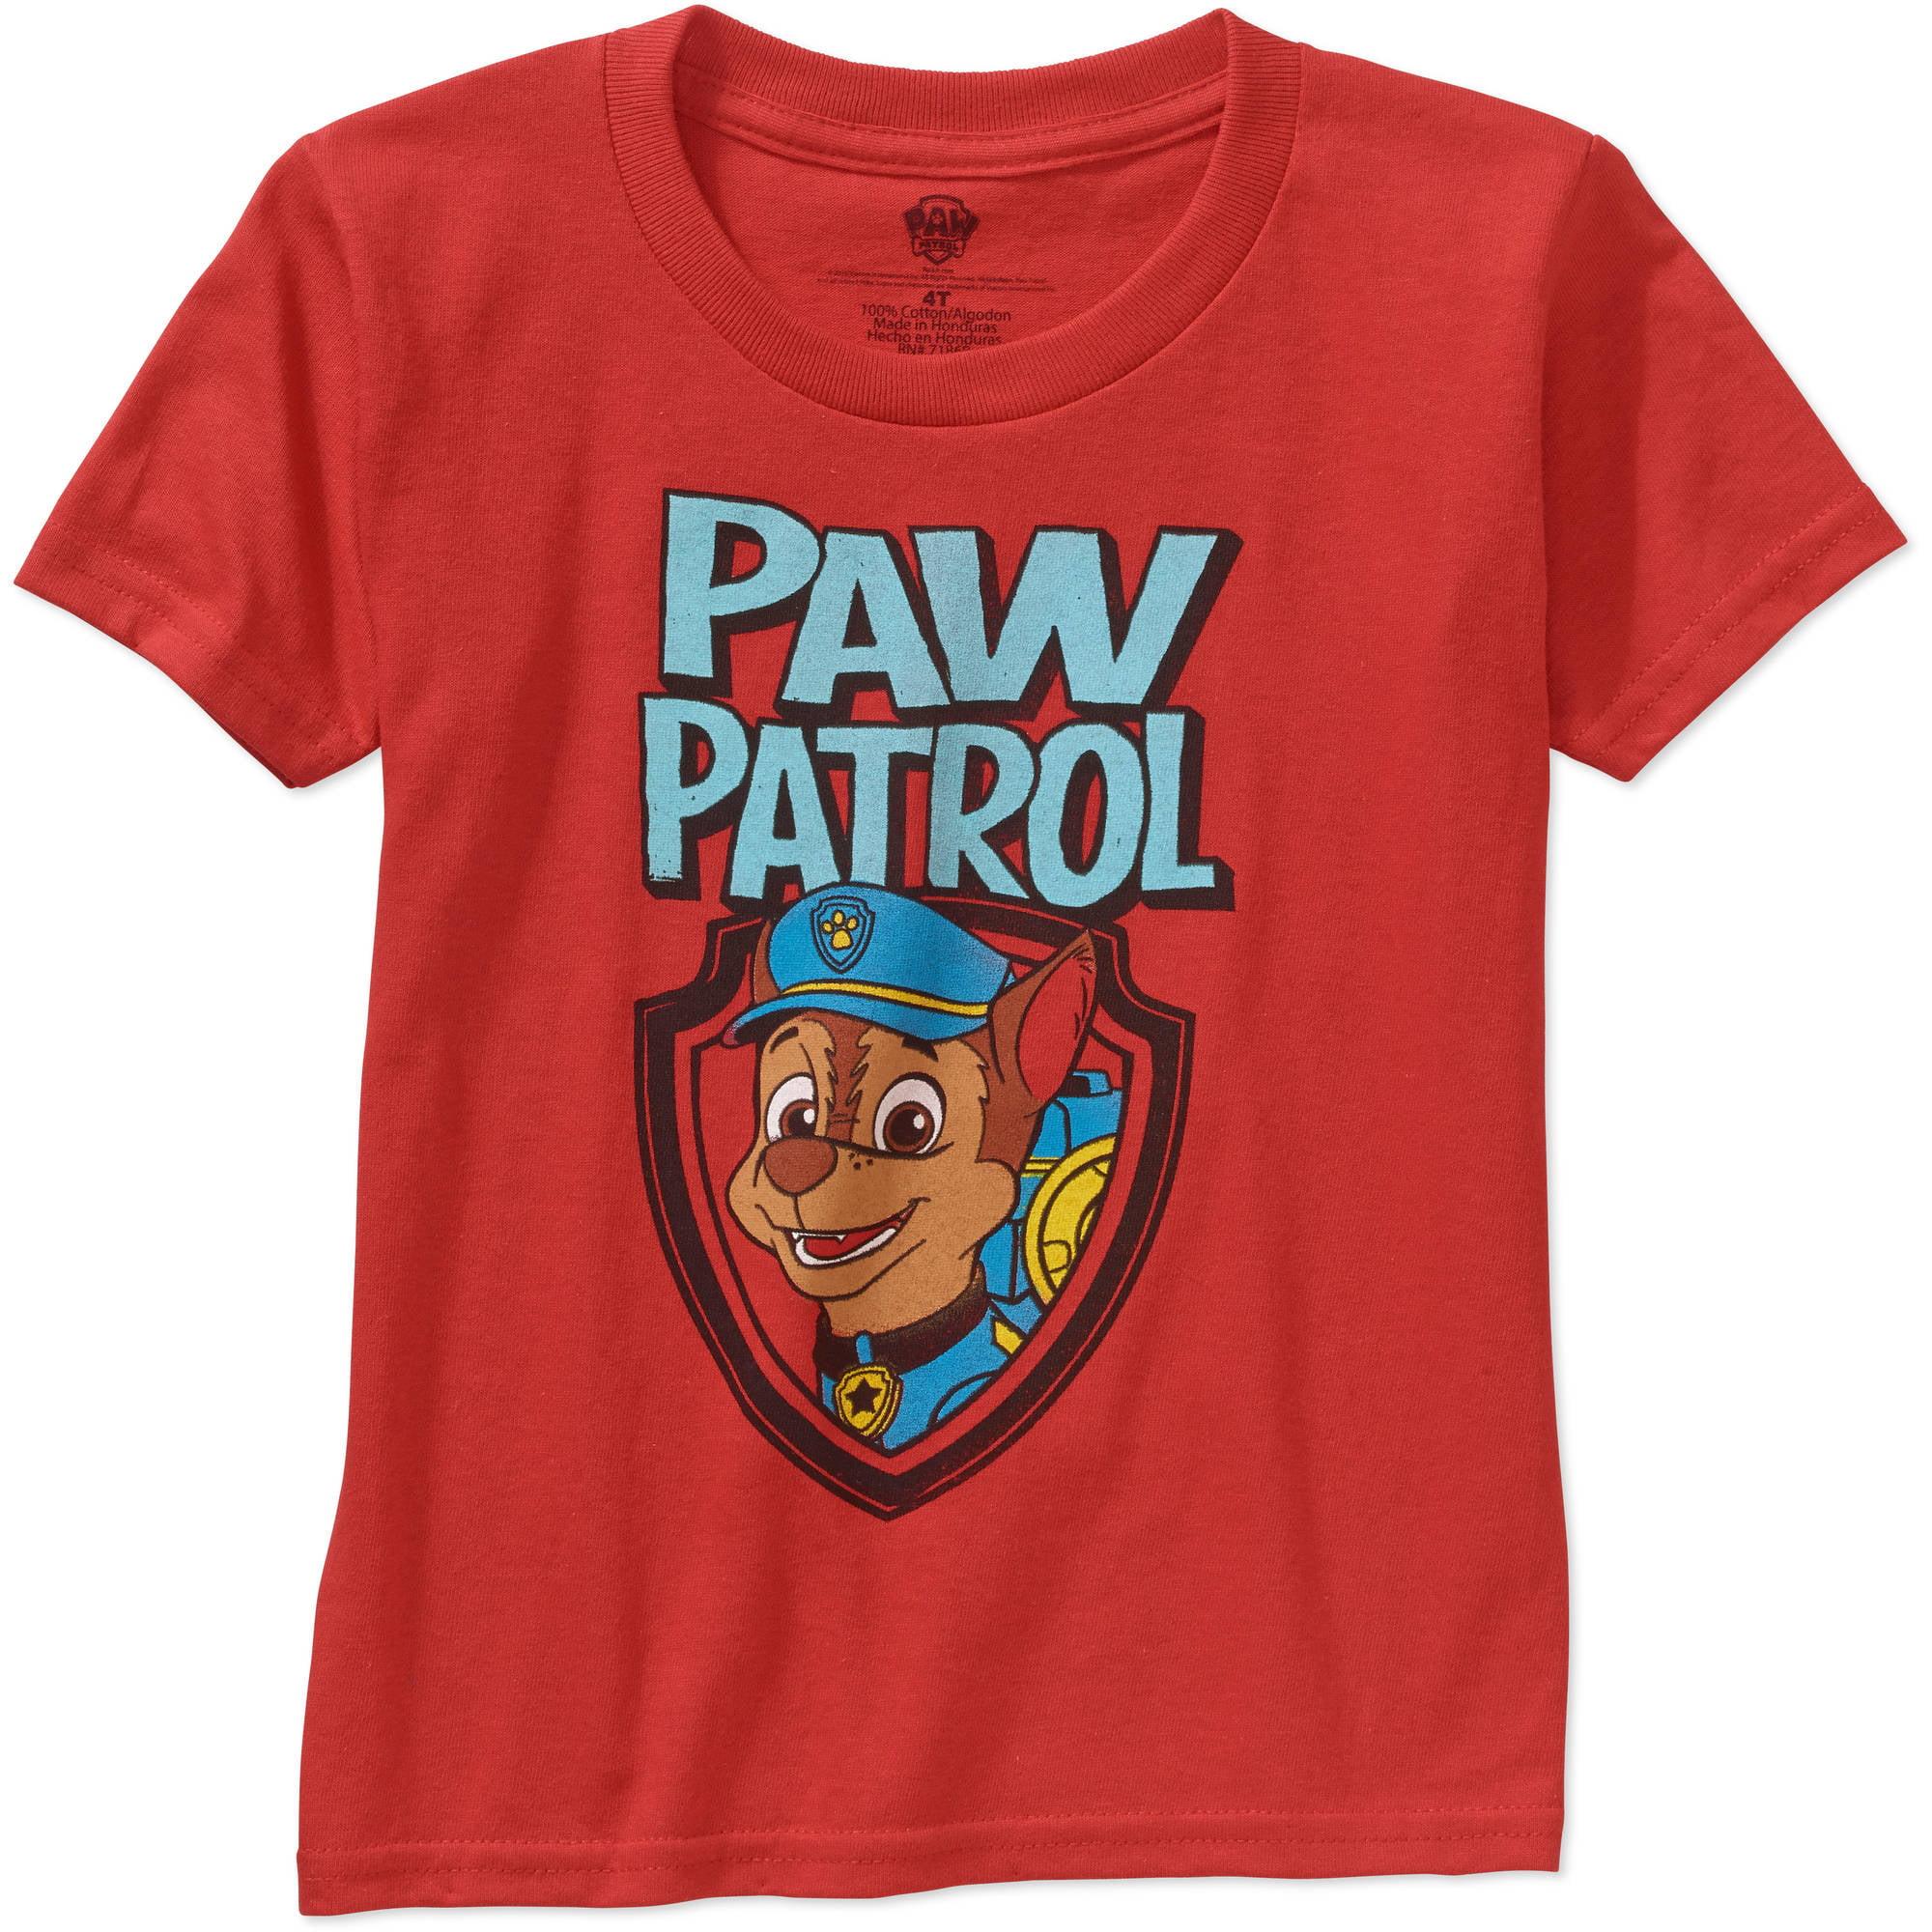 Nickelodeon Paw Patrol Toddler Boy Short Sleeve Graphic Tshirt